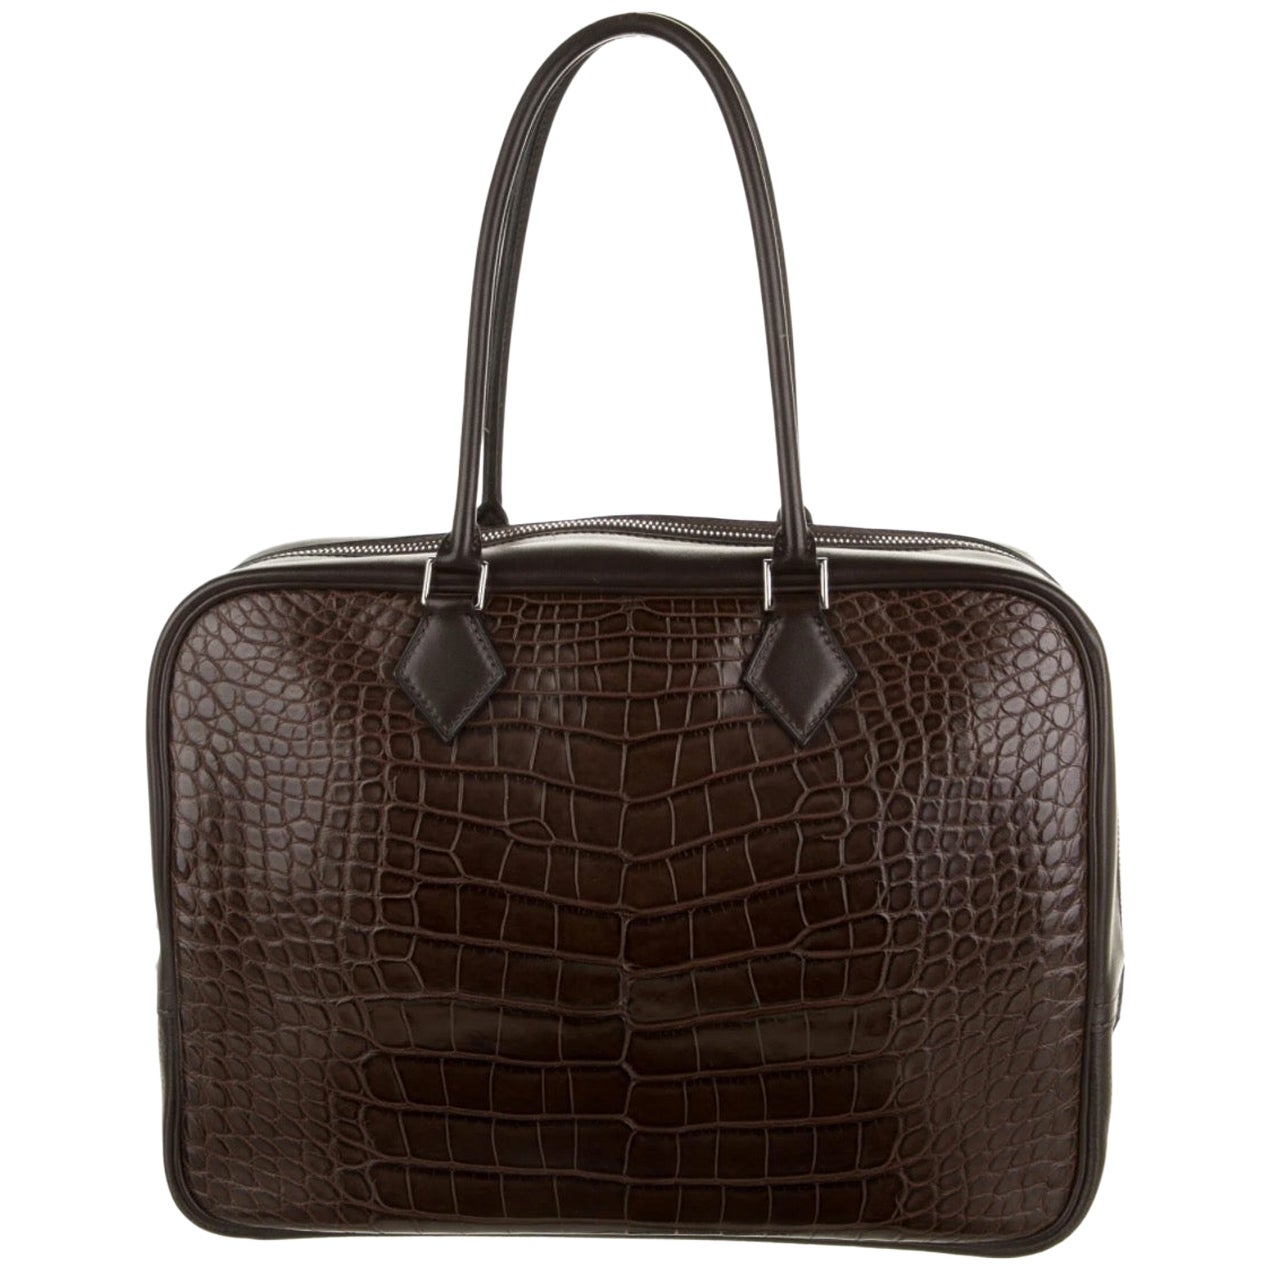 Hermes Choc Brown Alligator Exotic Skin Large Evening Top Handle Satchel Bag